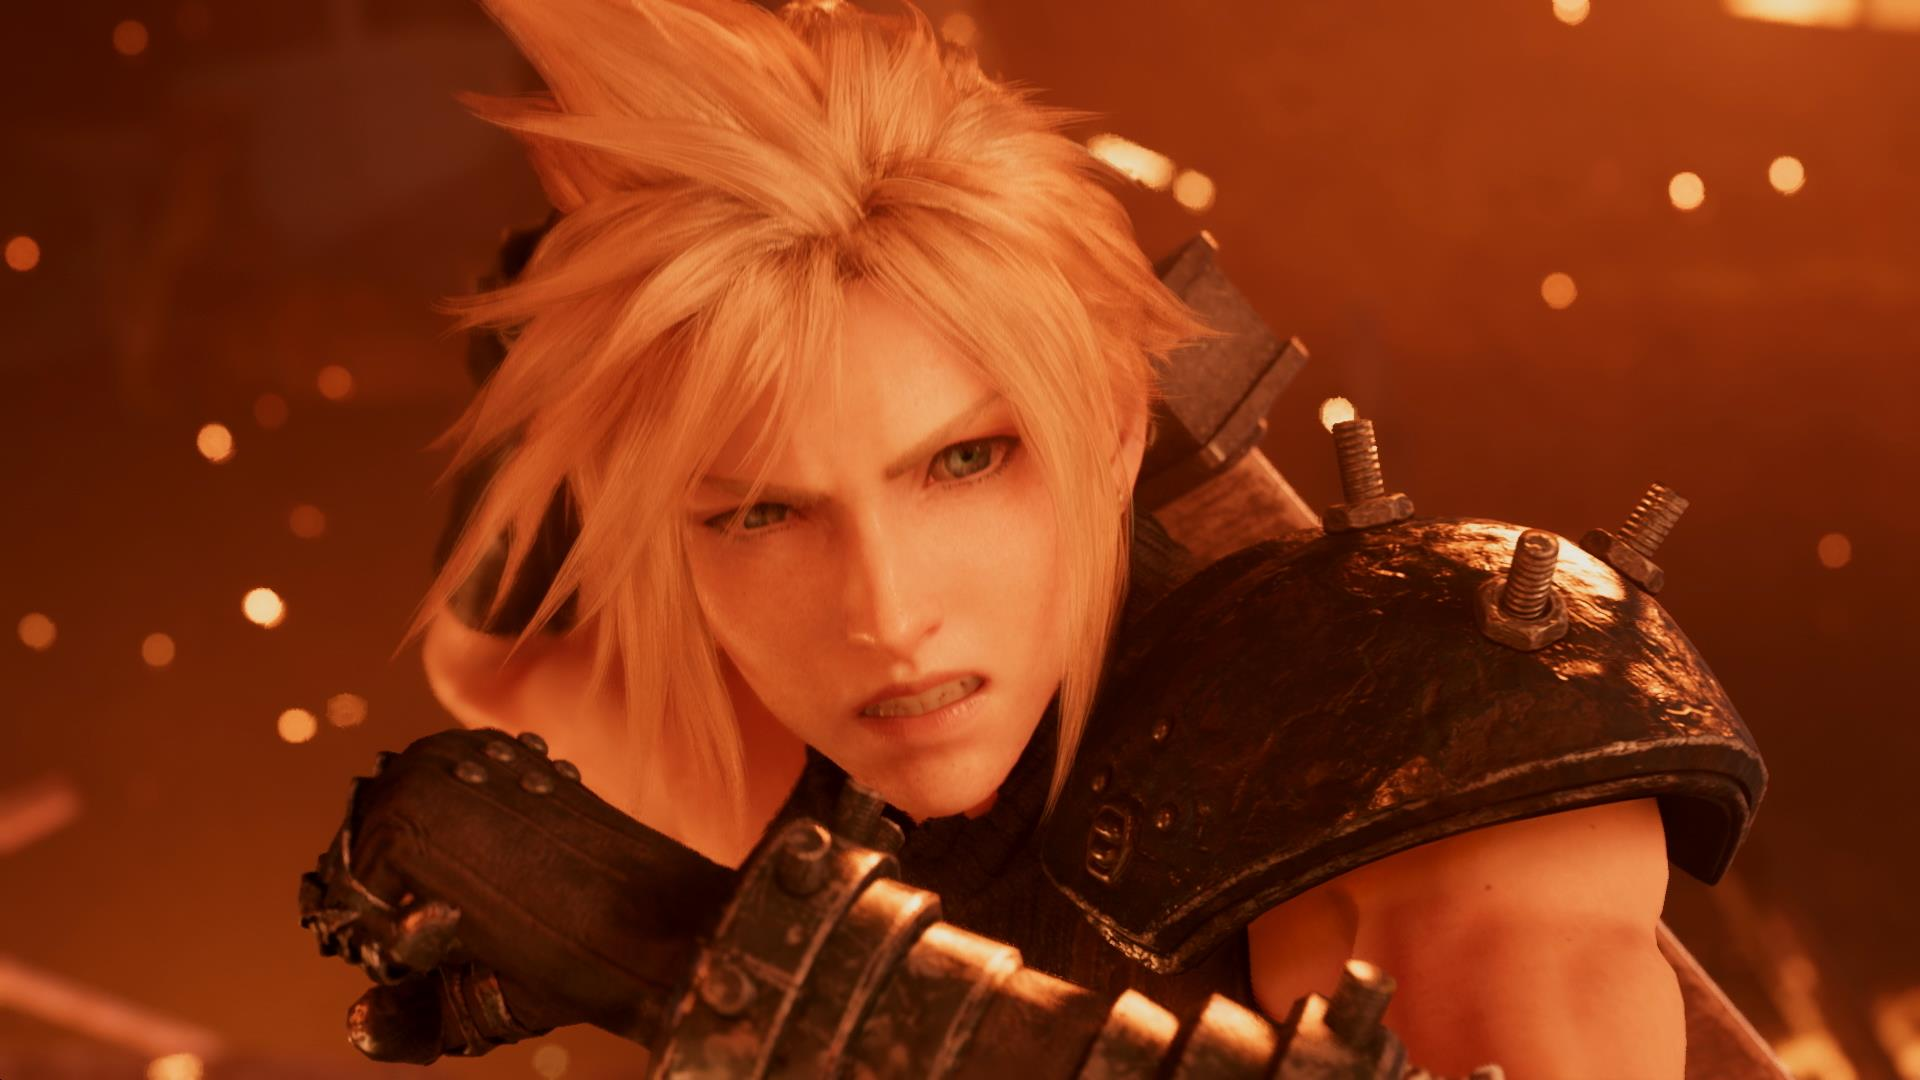 Final Fantasy 7 Remake - Final Fantasy 7 Remake Cloud 2019 - HD Wallpaper